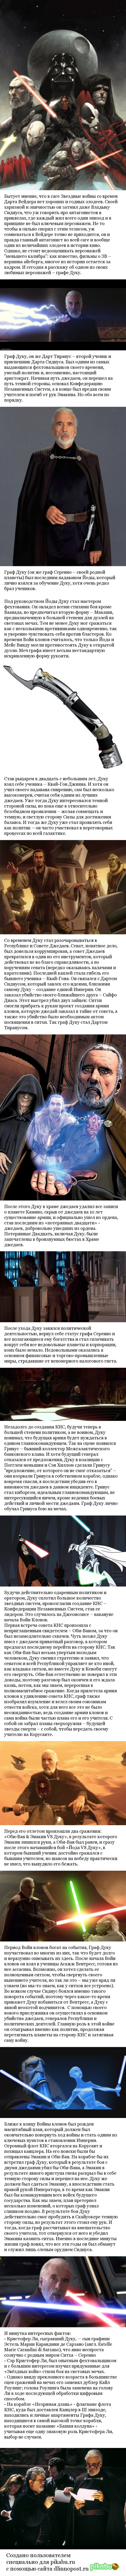 Персонажи Звездный Войн - Граф Дуку. Star wars, Фантастика, Кристофер ли, Ситхи, Длиннопост